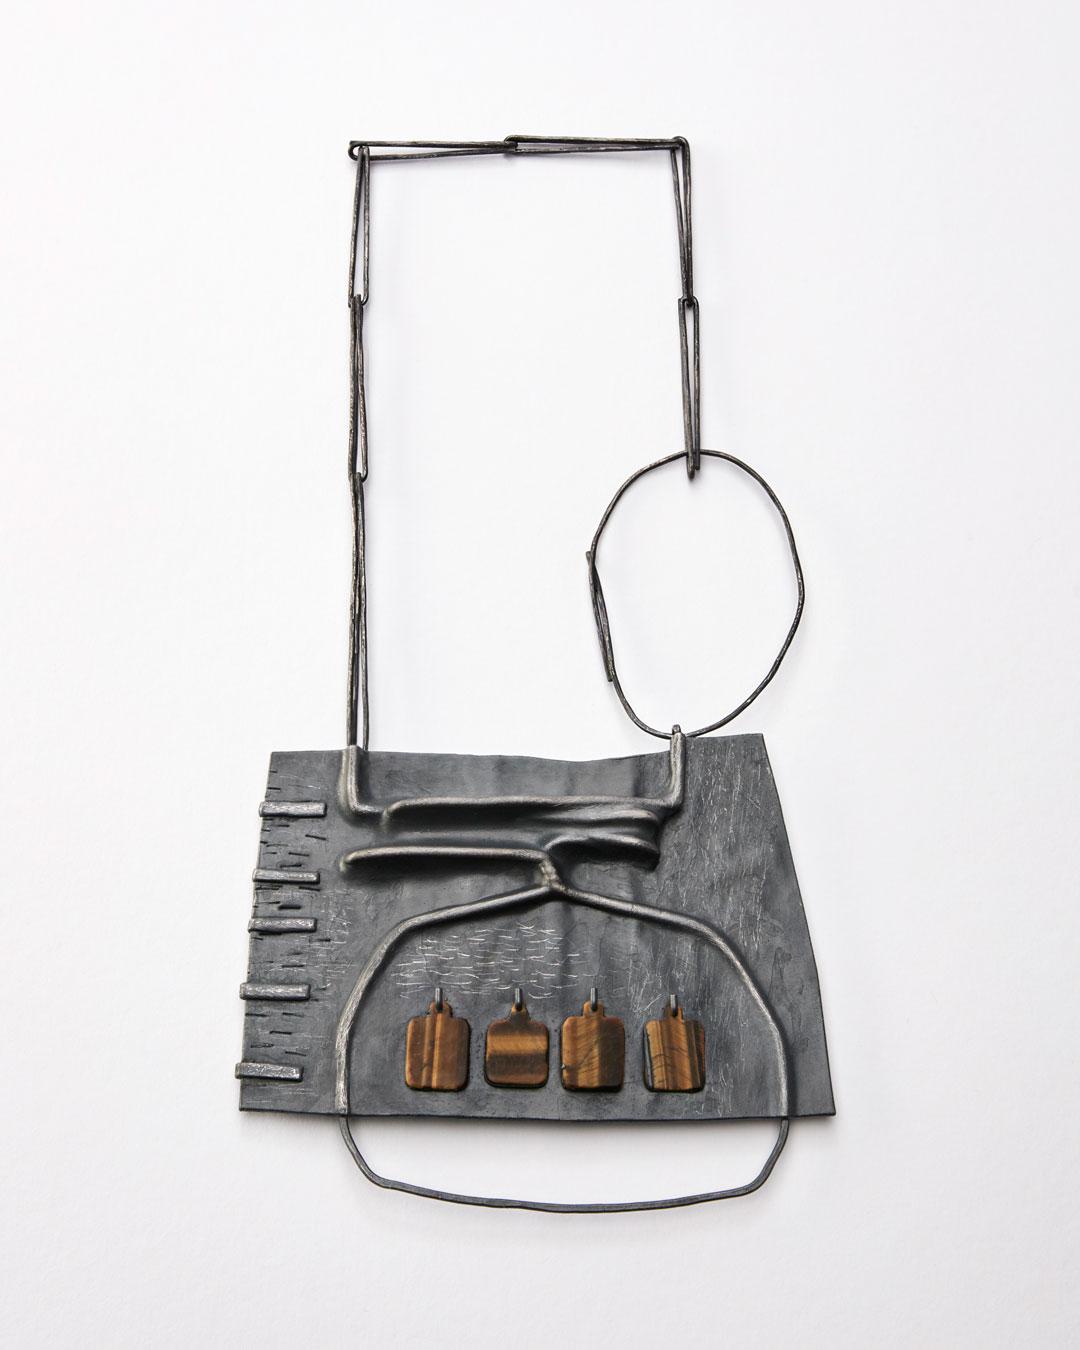 Iris Bodemer, Klang 3 (Sound 3), 2019, pendant; silver, thermoplastic, tiger's eye, 110 x 135 x 10 mm, €4250